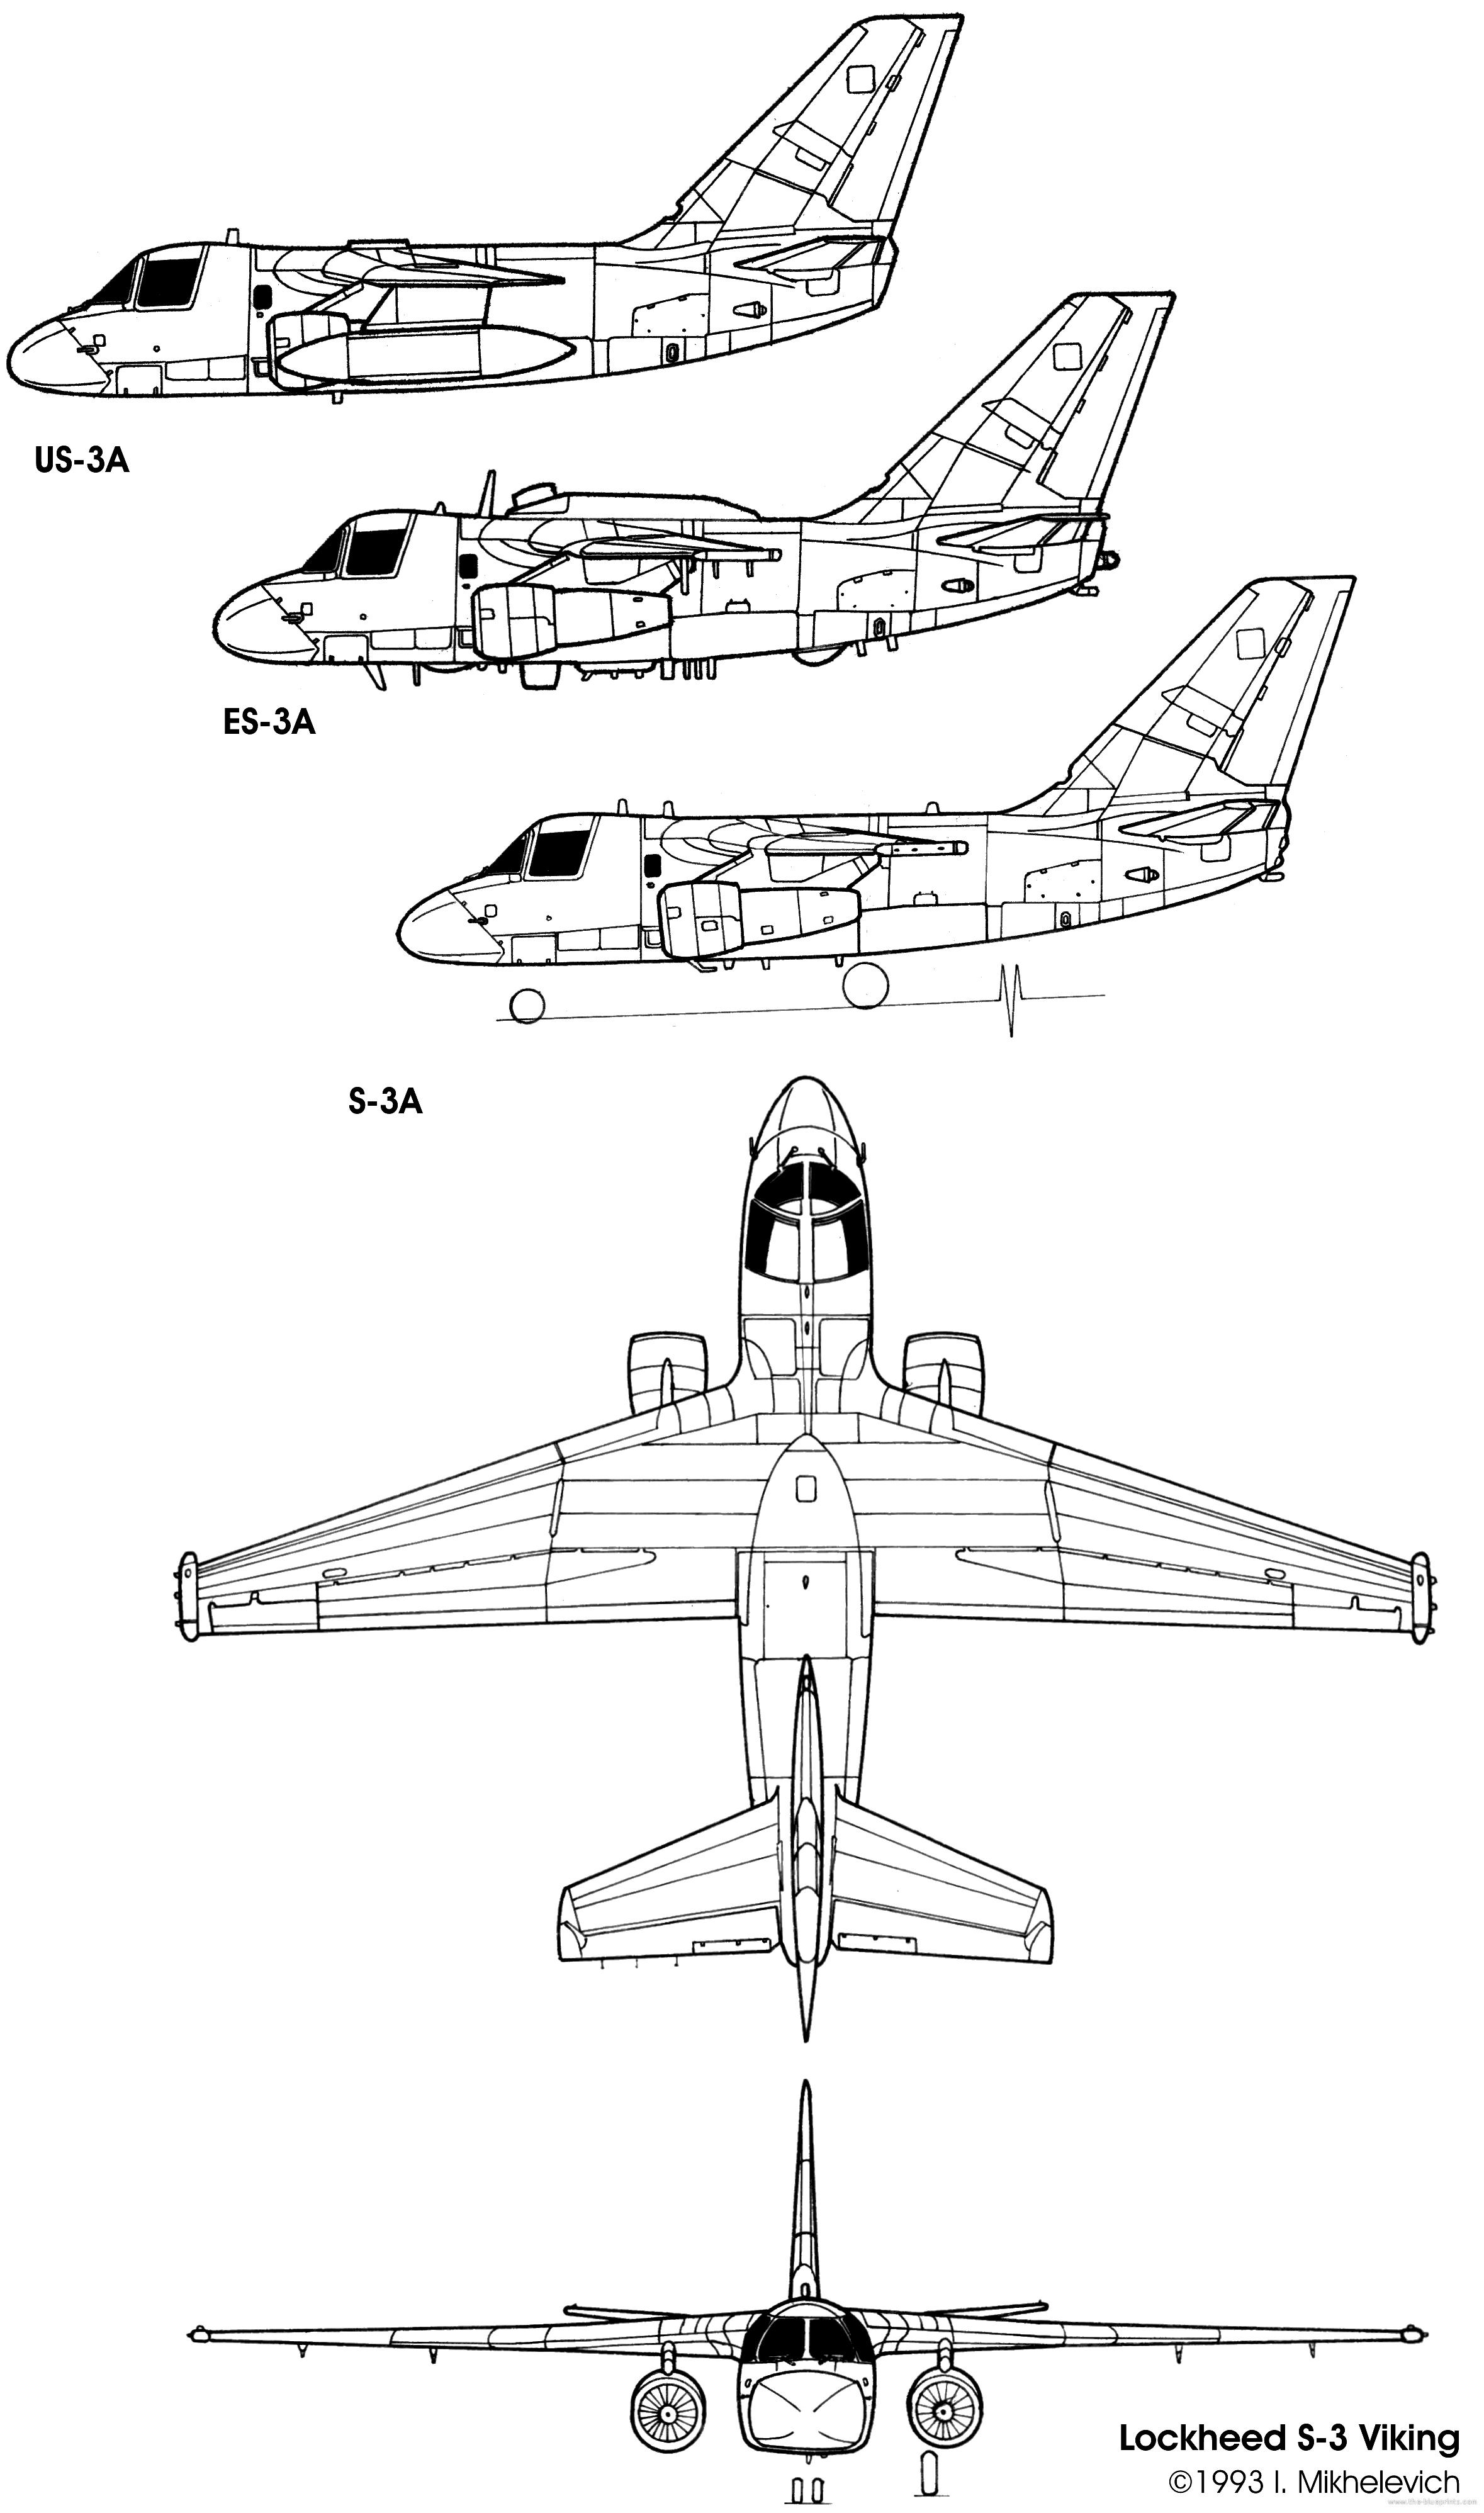 Lockheed S 3 Viking